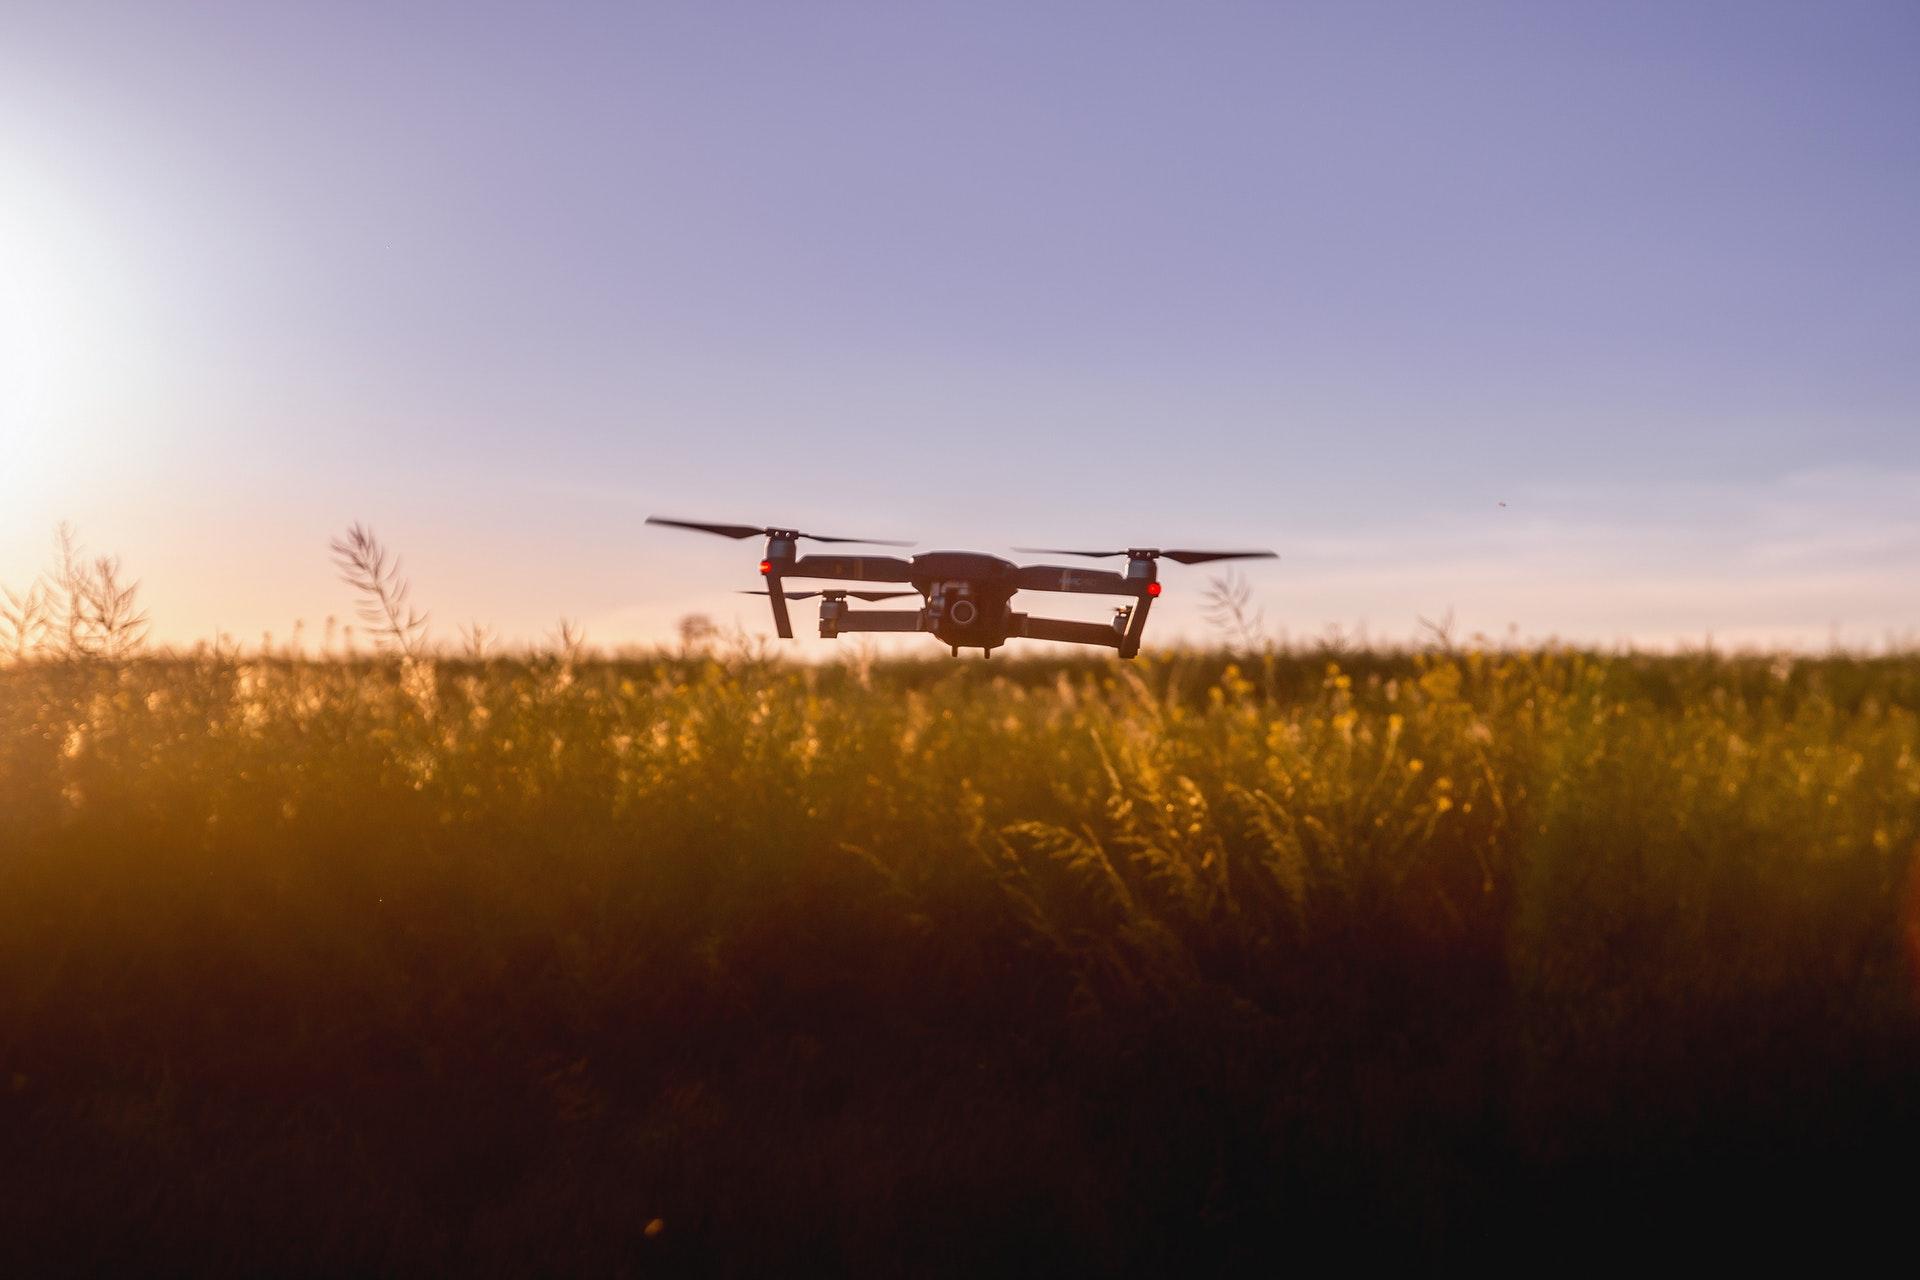 DiscoverEI Drone Videography